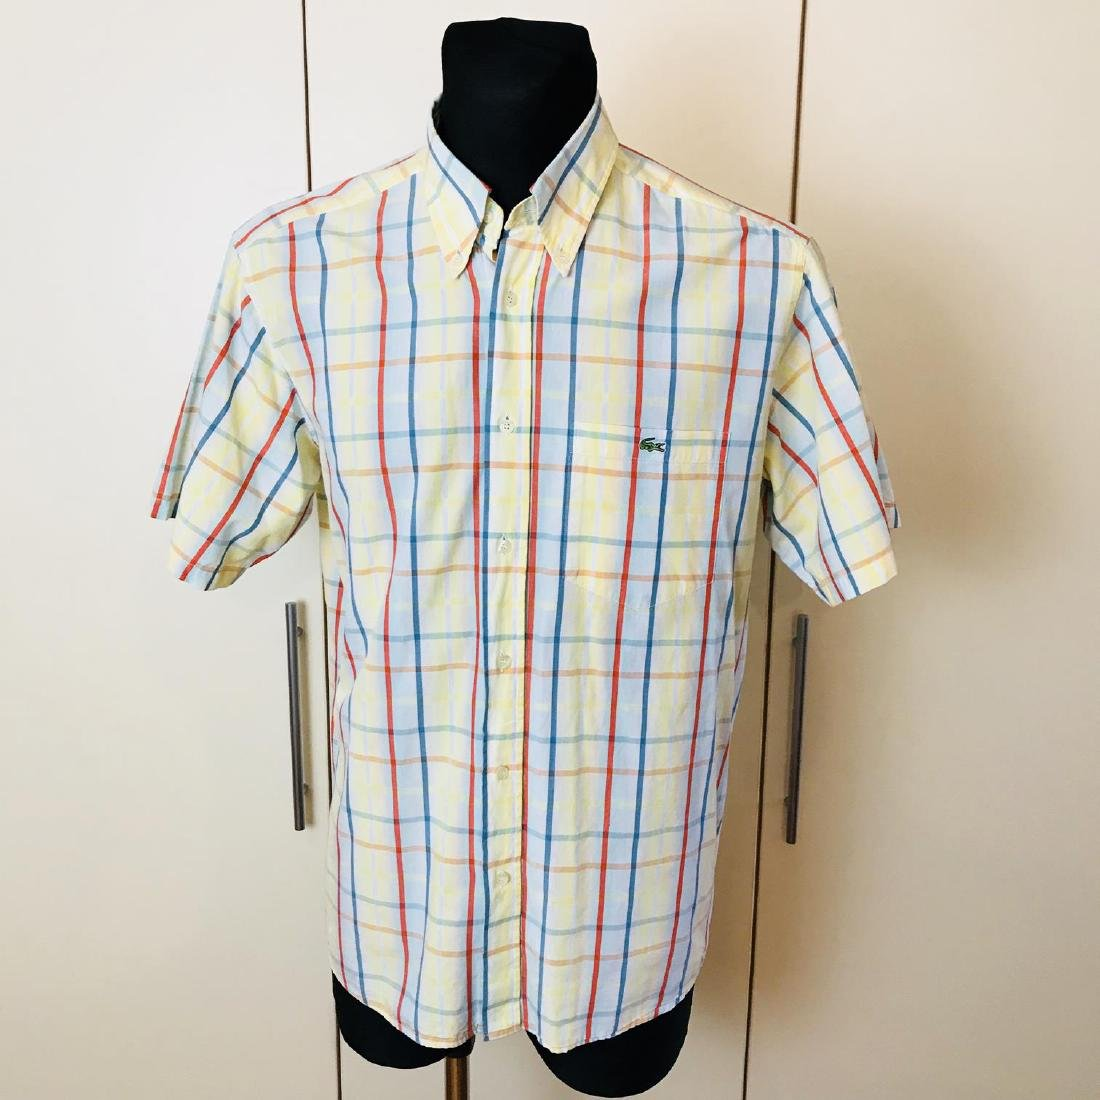 Men's Lacoste Short Sleeve Shirt Top Size US 41 Large